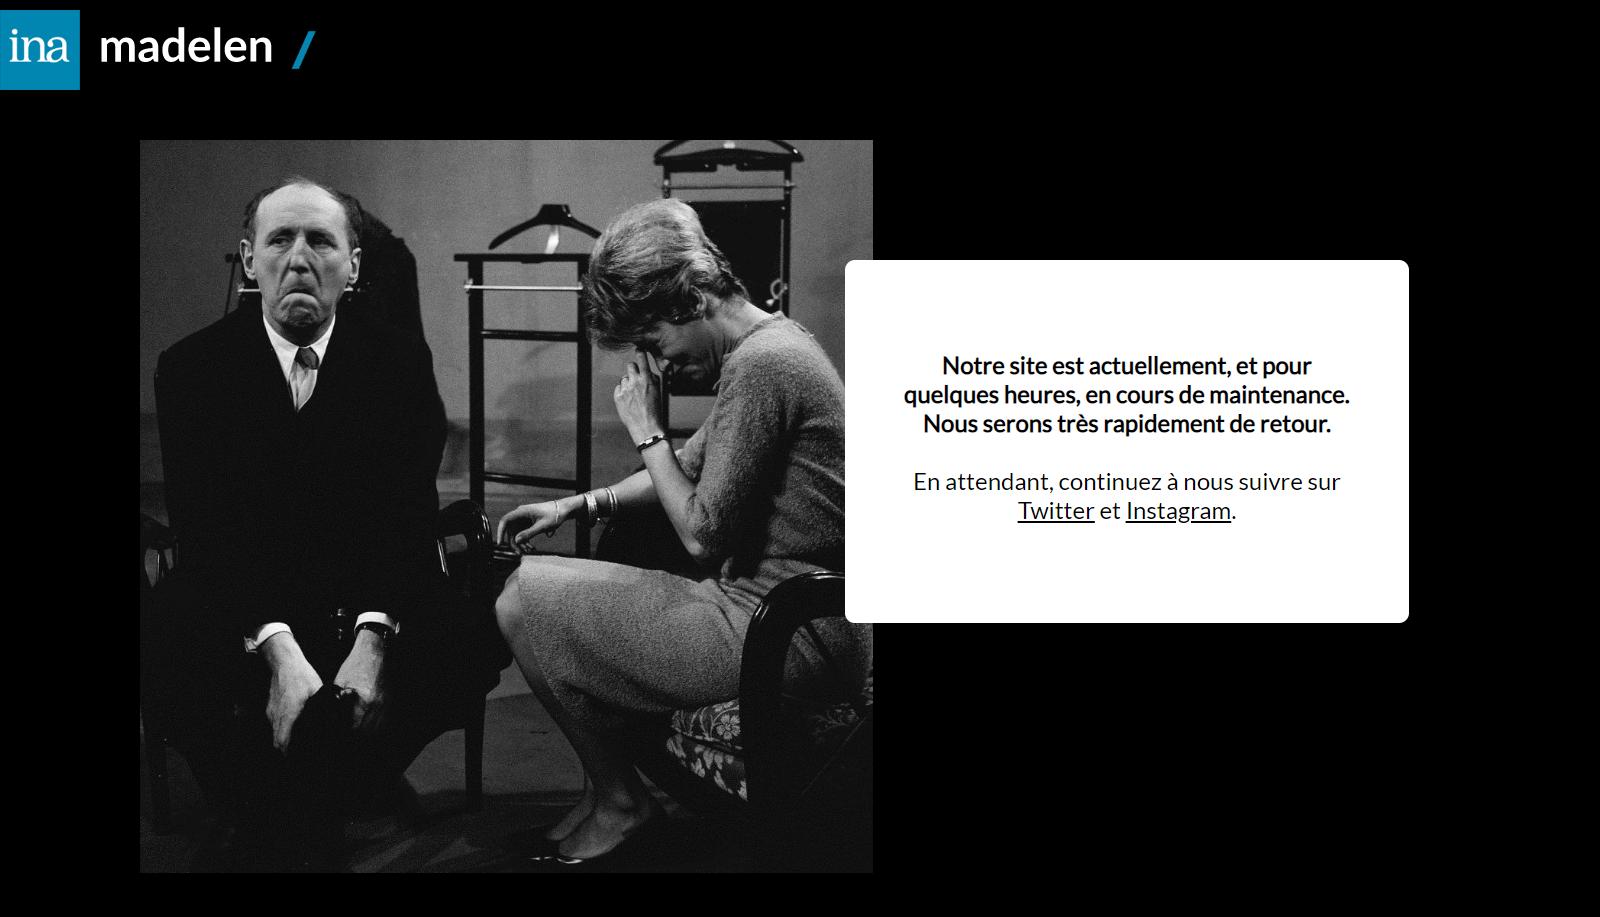 screencapture-madelen-ina-fr-2020-04-01-03_29_18